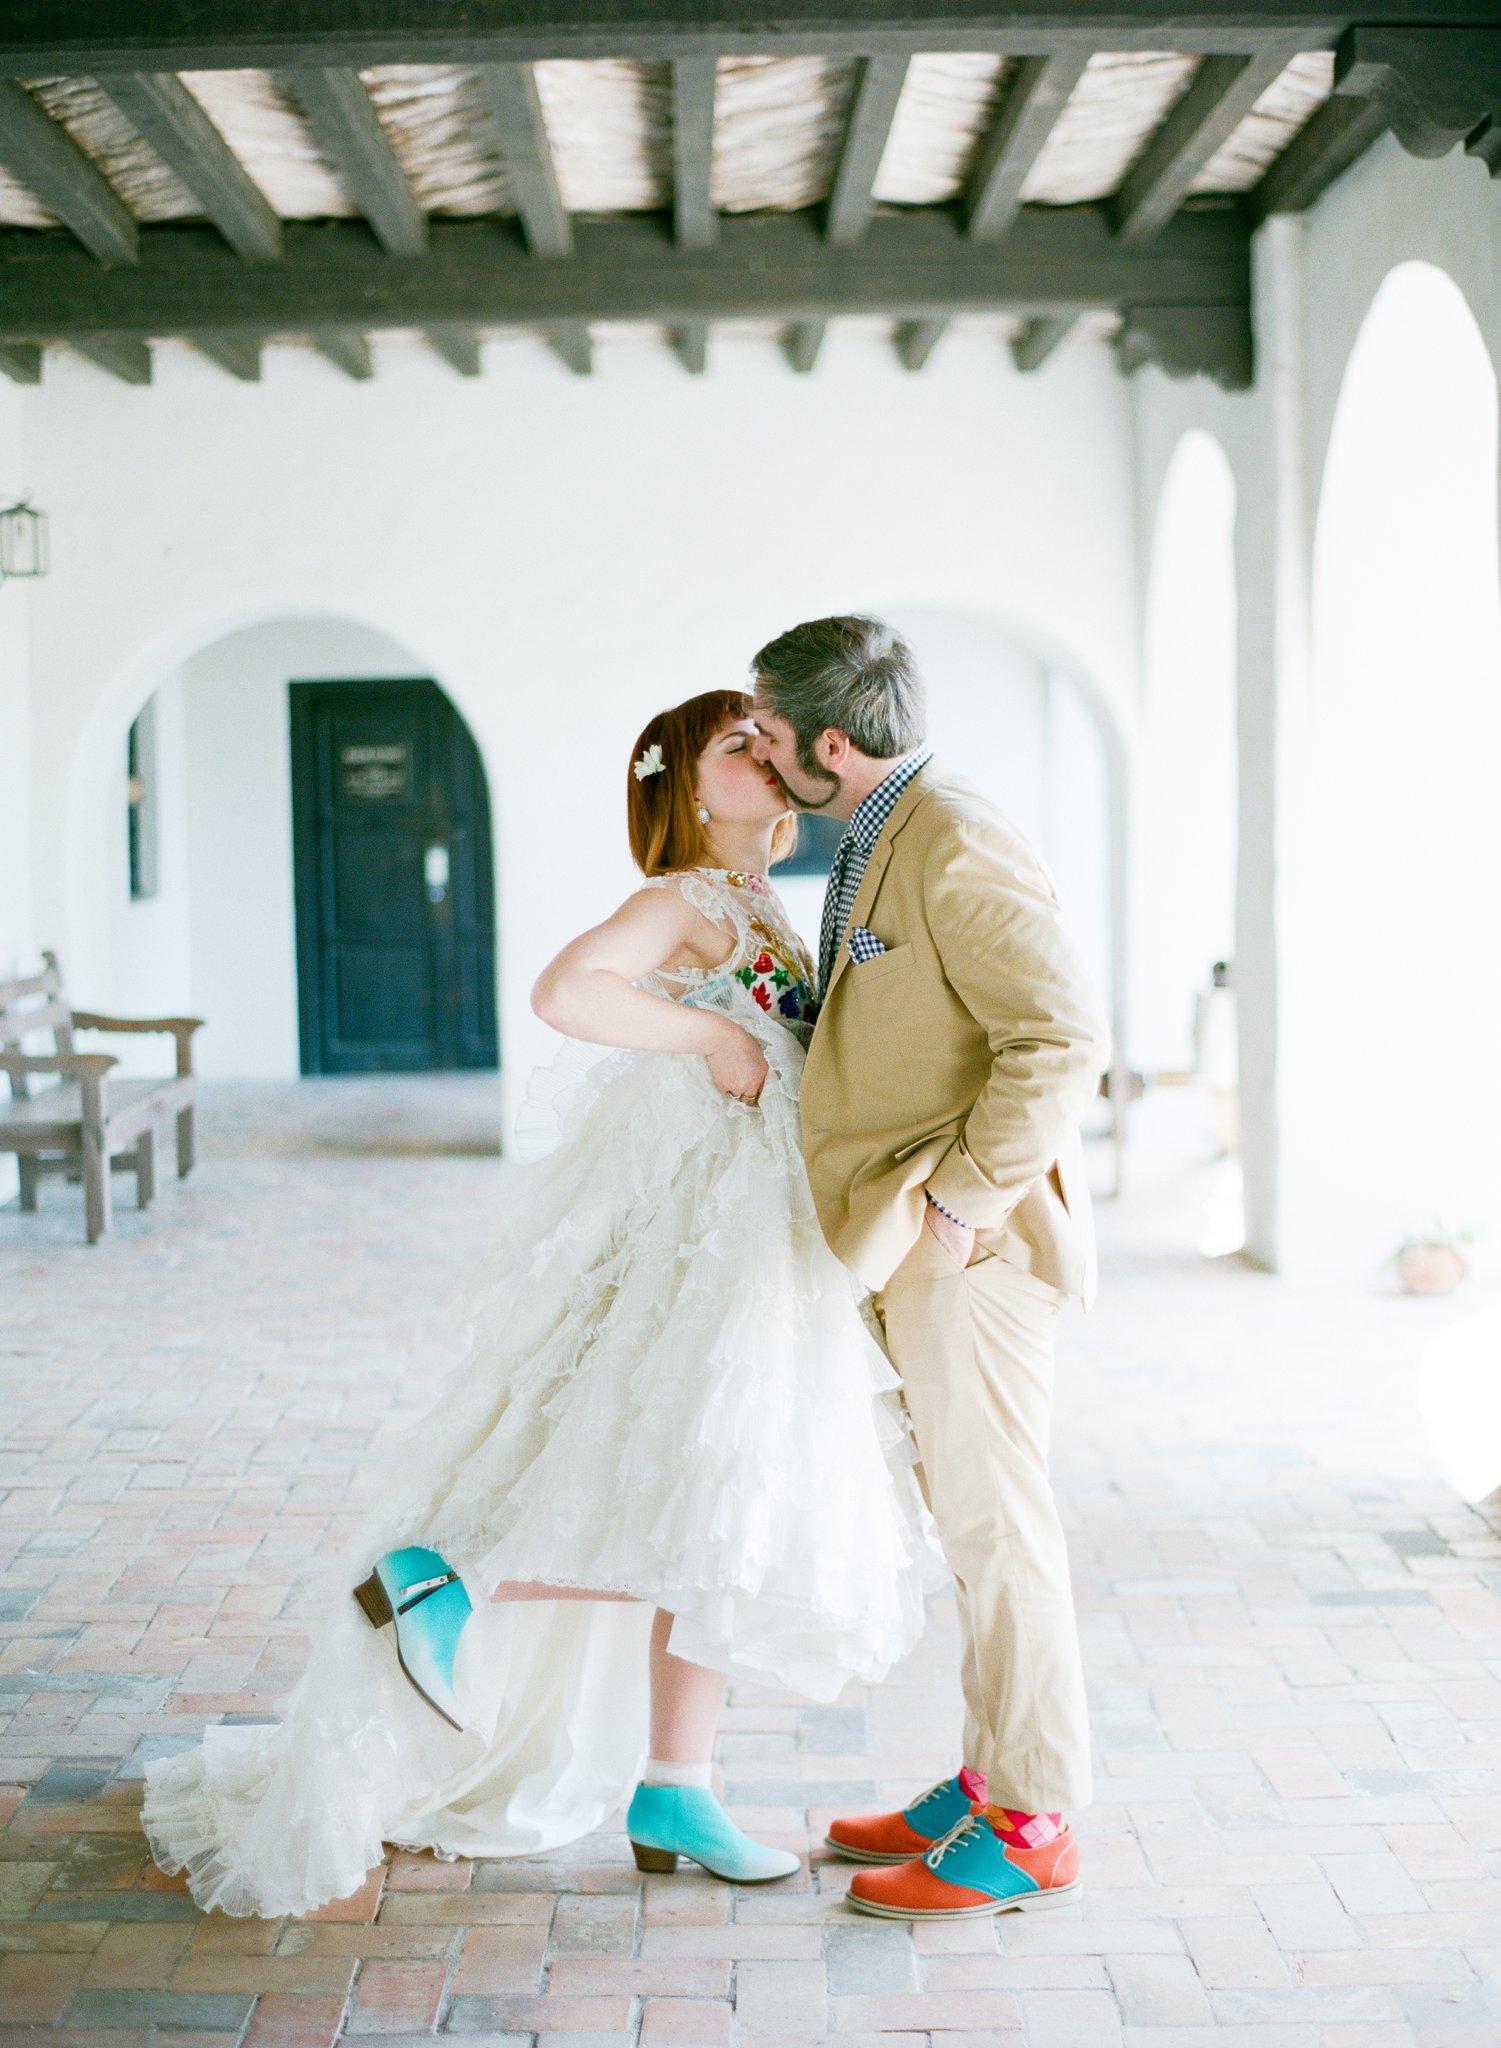 eclectic texan wedding the connoisseur of cute wedding texas wedding photographer shannon griffin photography_0039.jpg